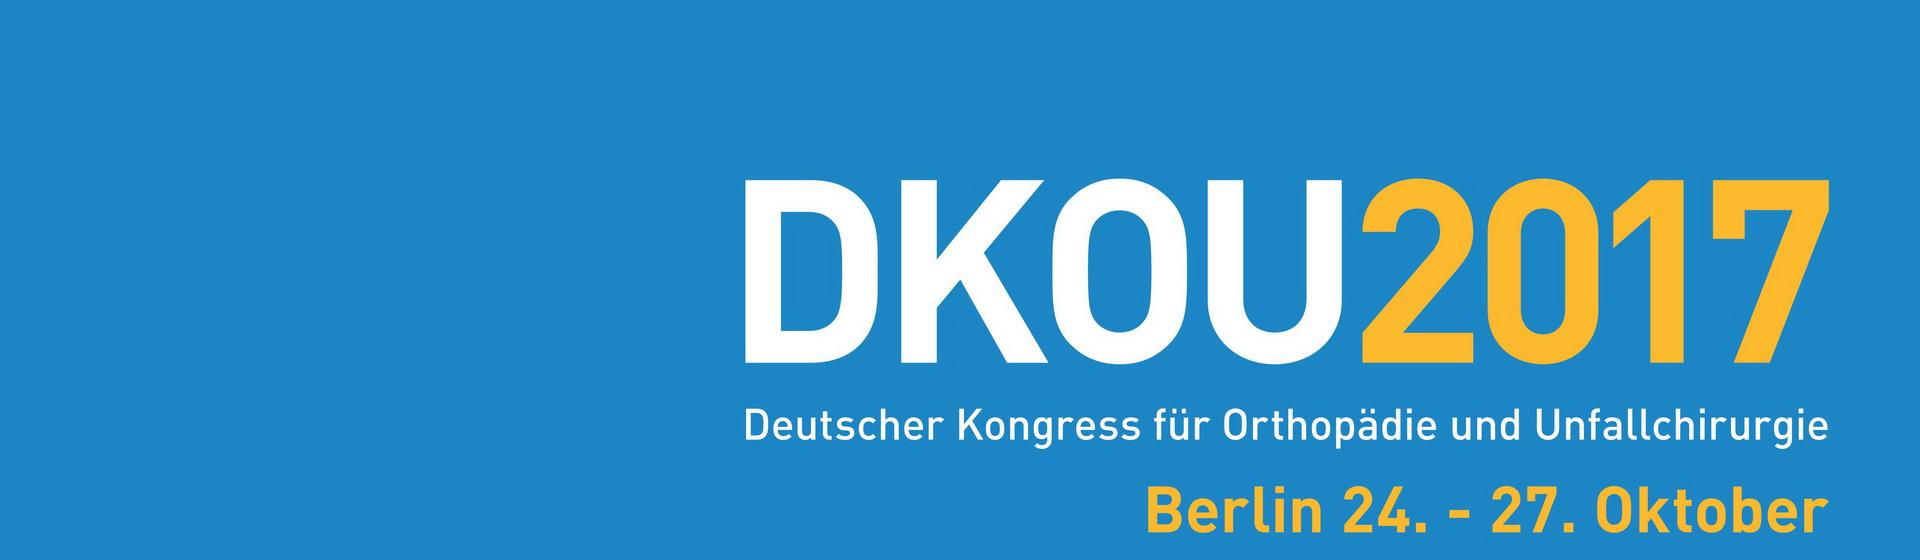 DKOU 2017: